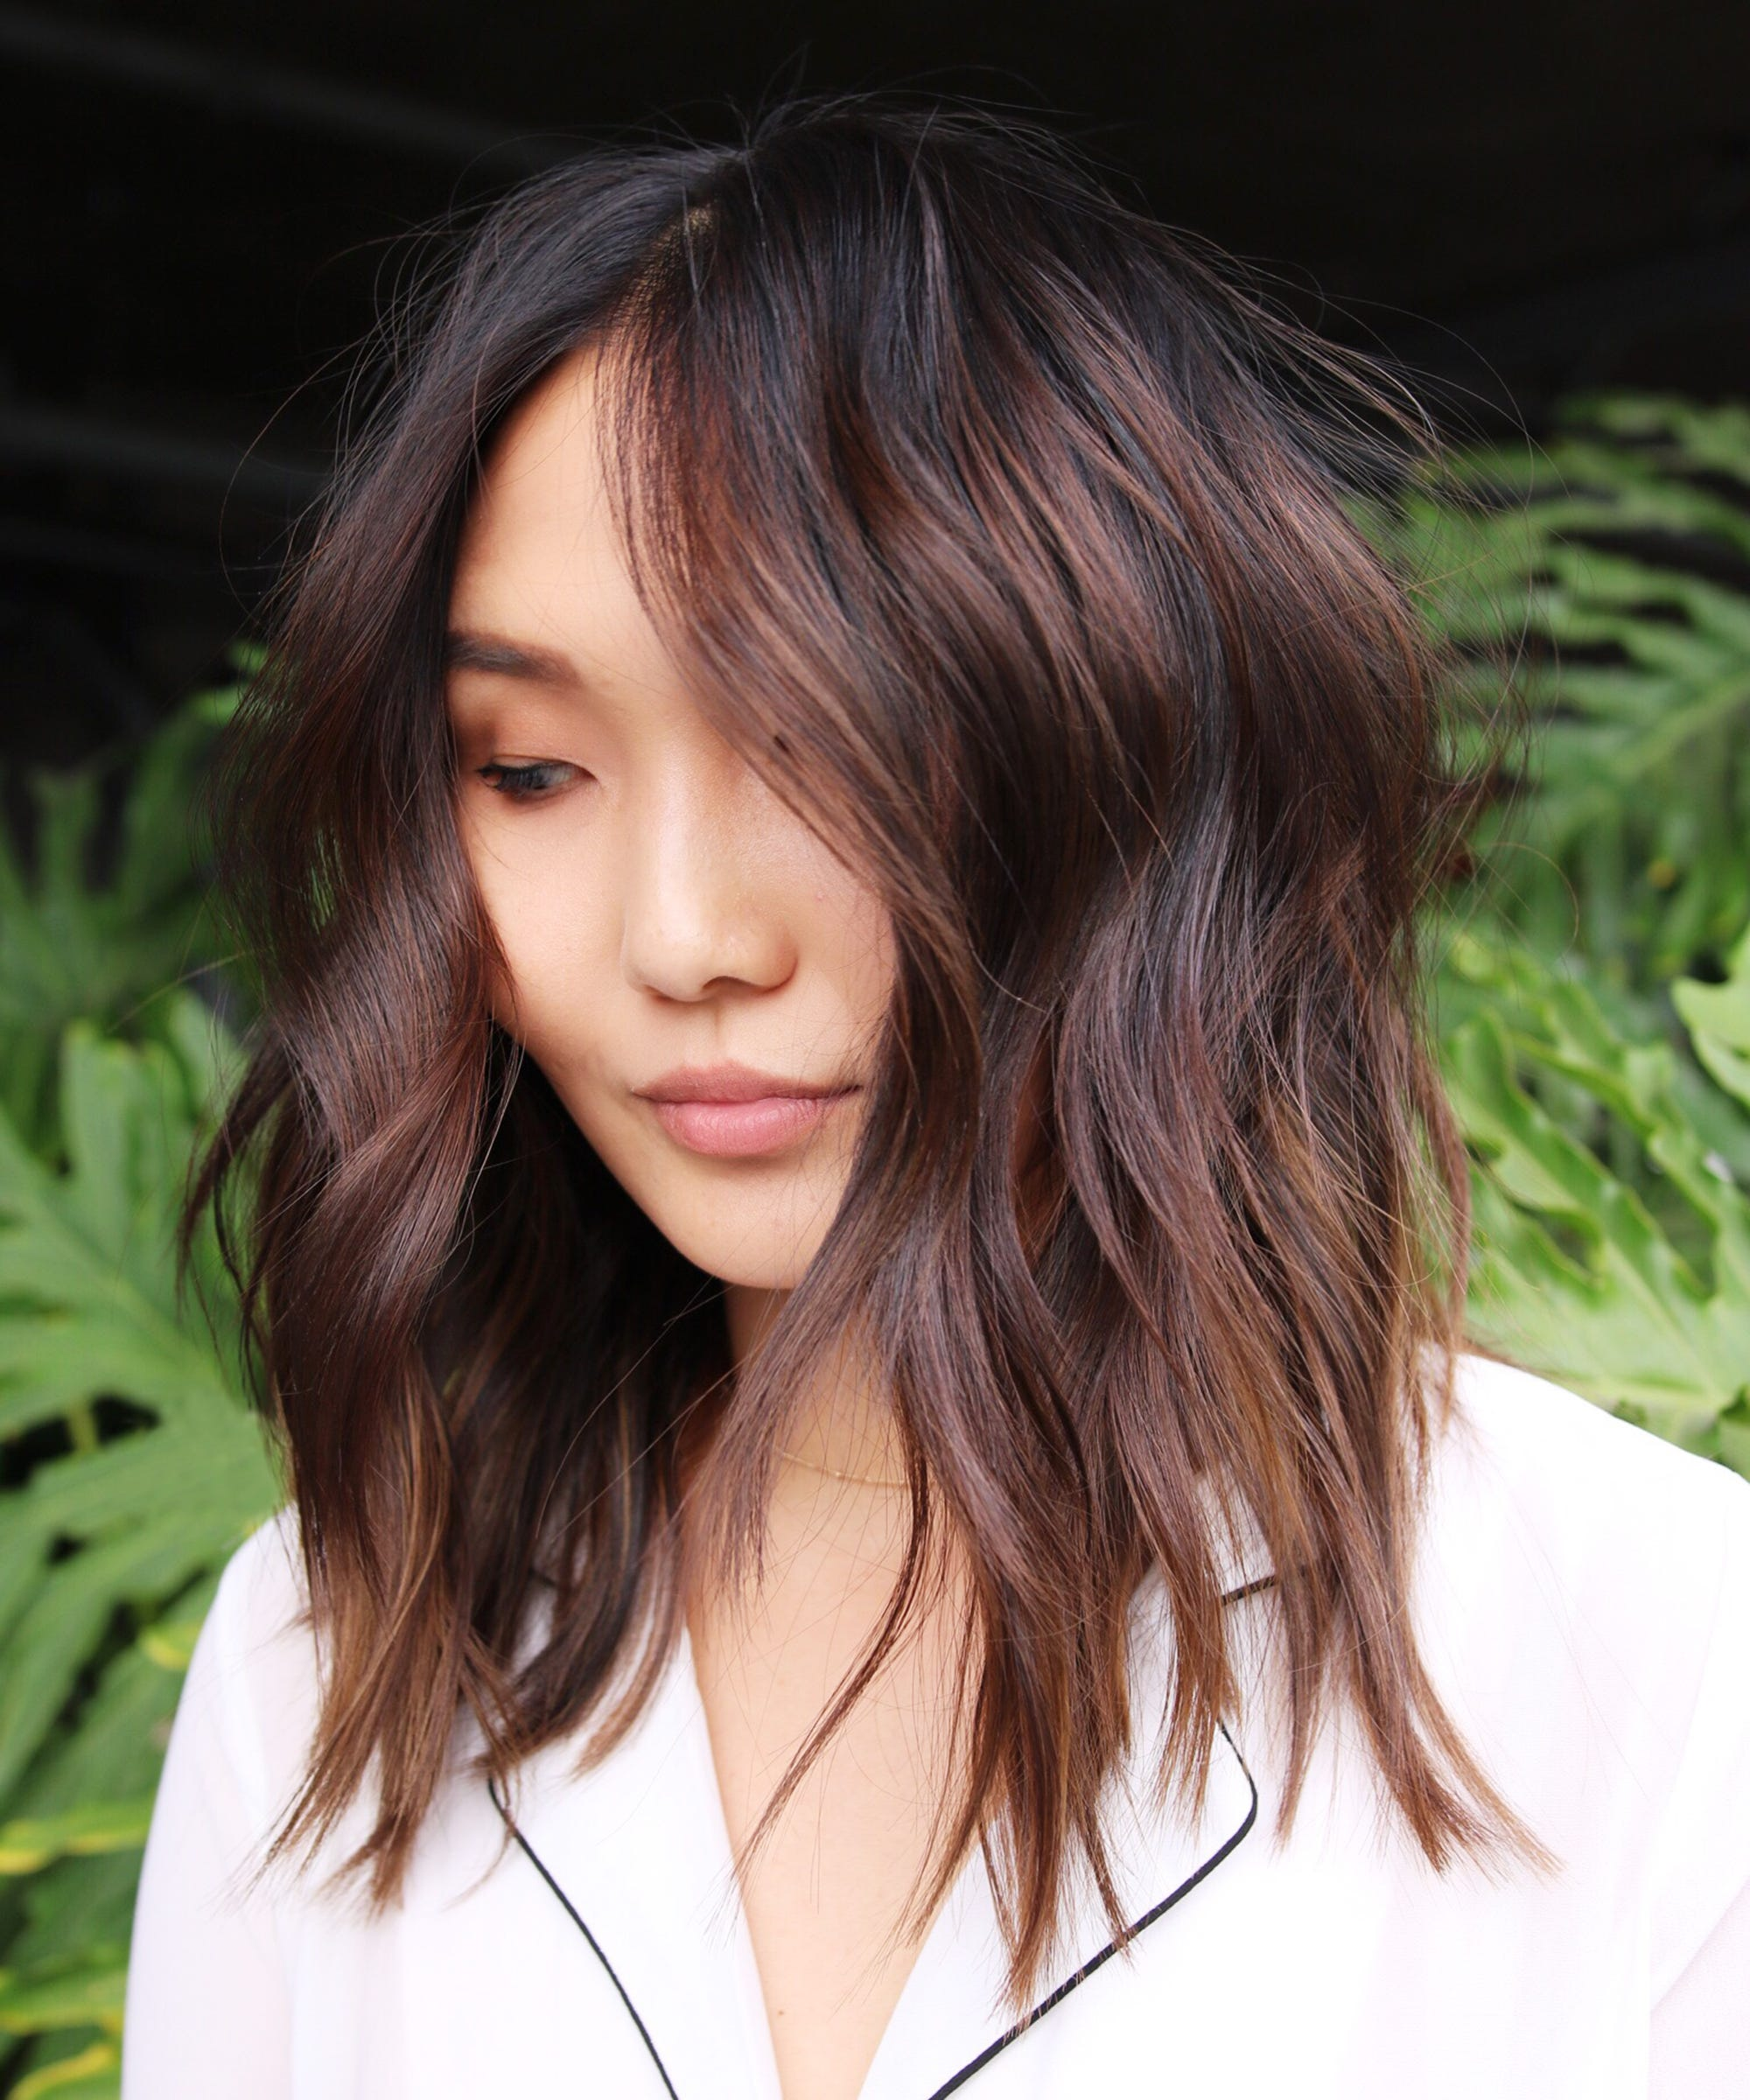 Hair Color Ideas 2018 Fall Winter Hair Trends